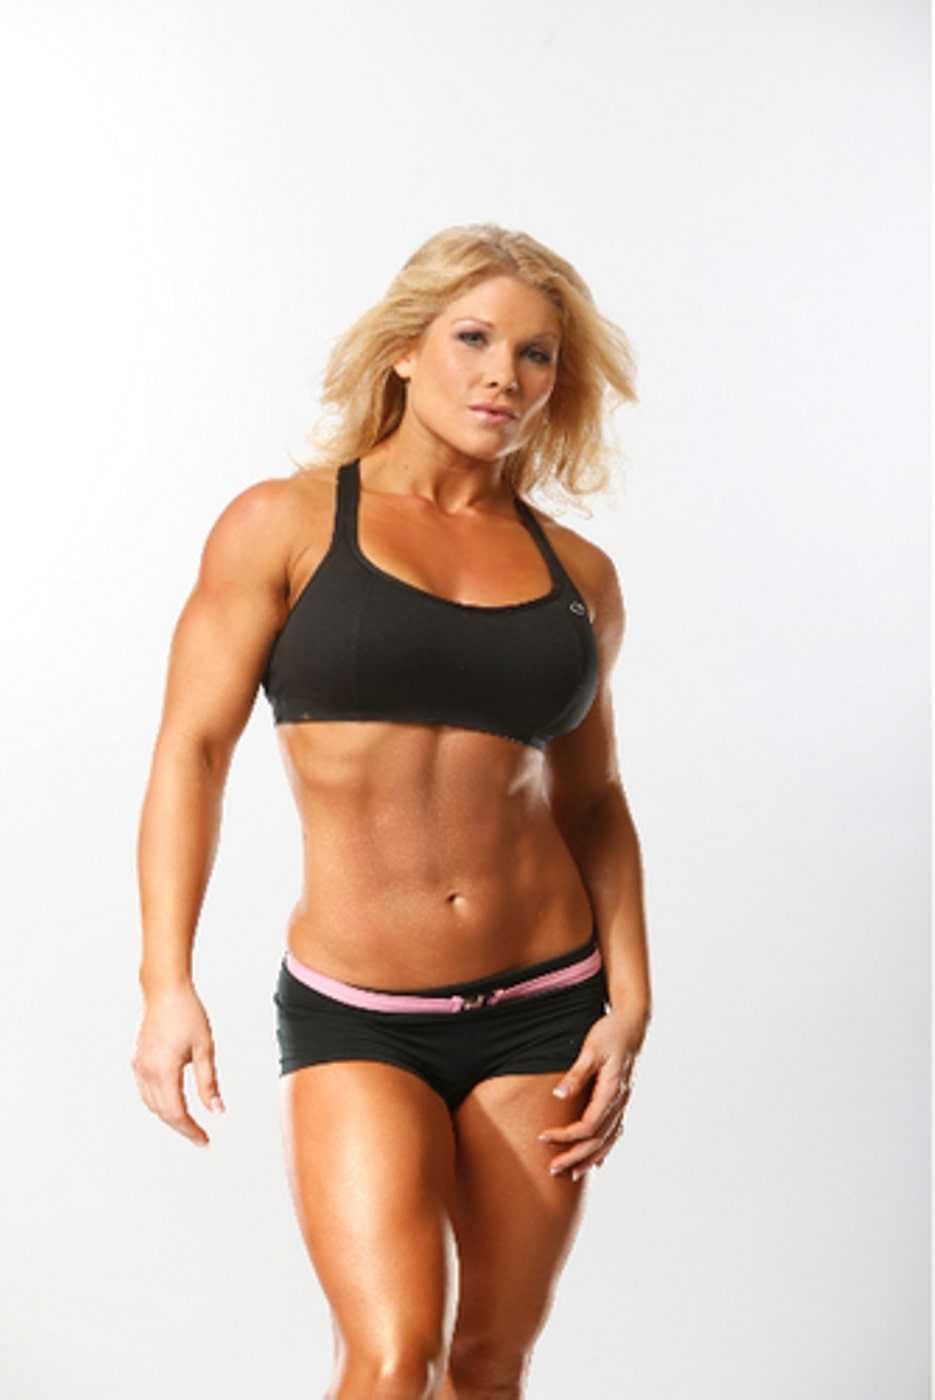 Beth Phoenix hot legs pic